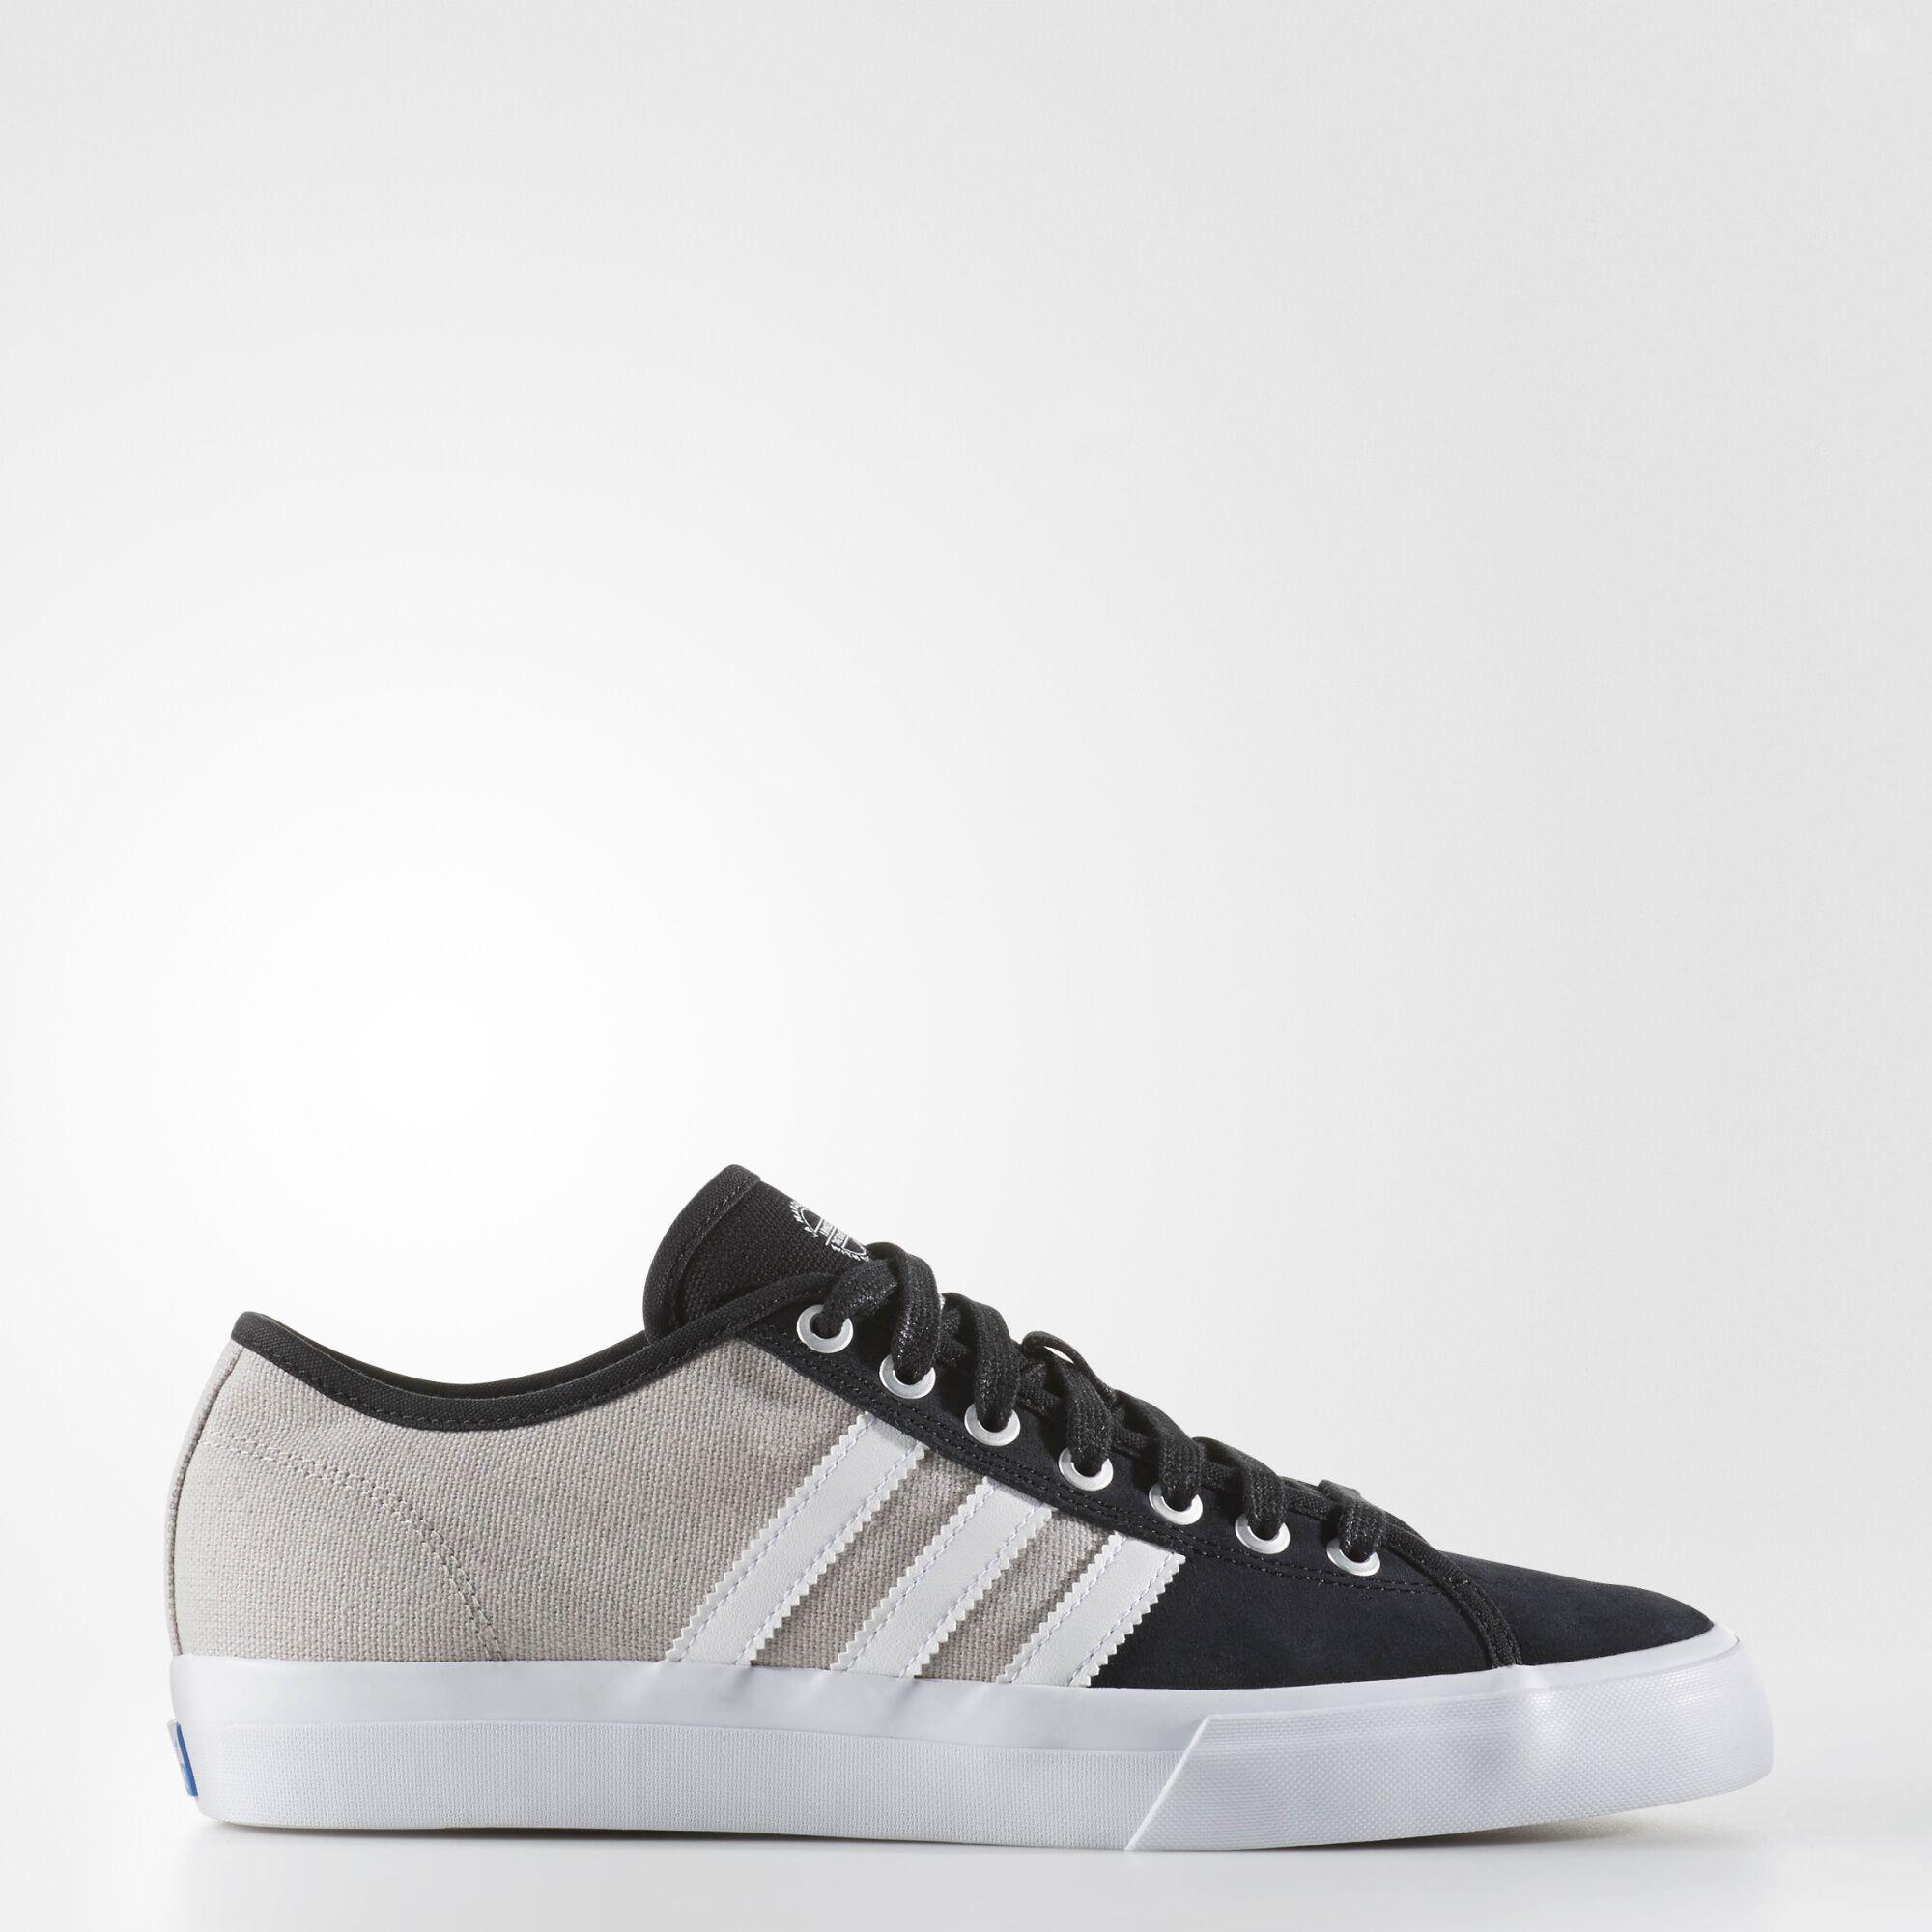 Adidas skate shoes zumiez - Adidas Matchcourt Rx Shoes Core Black Running White Bb8604